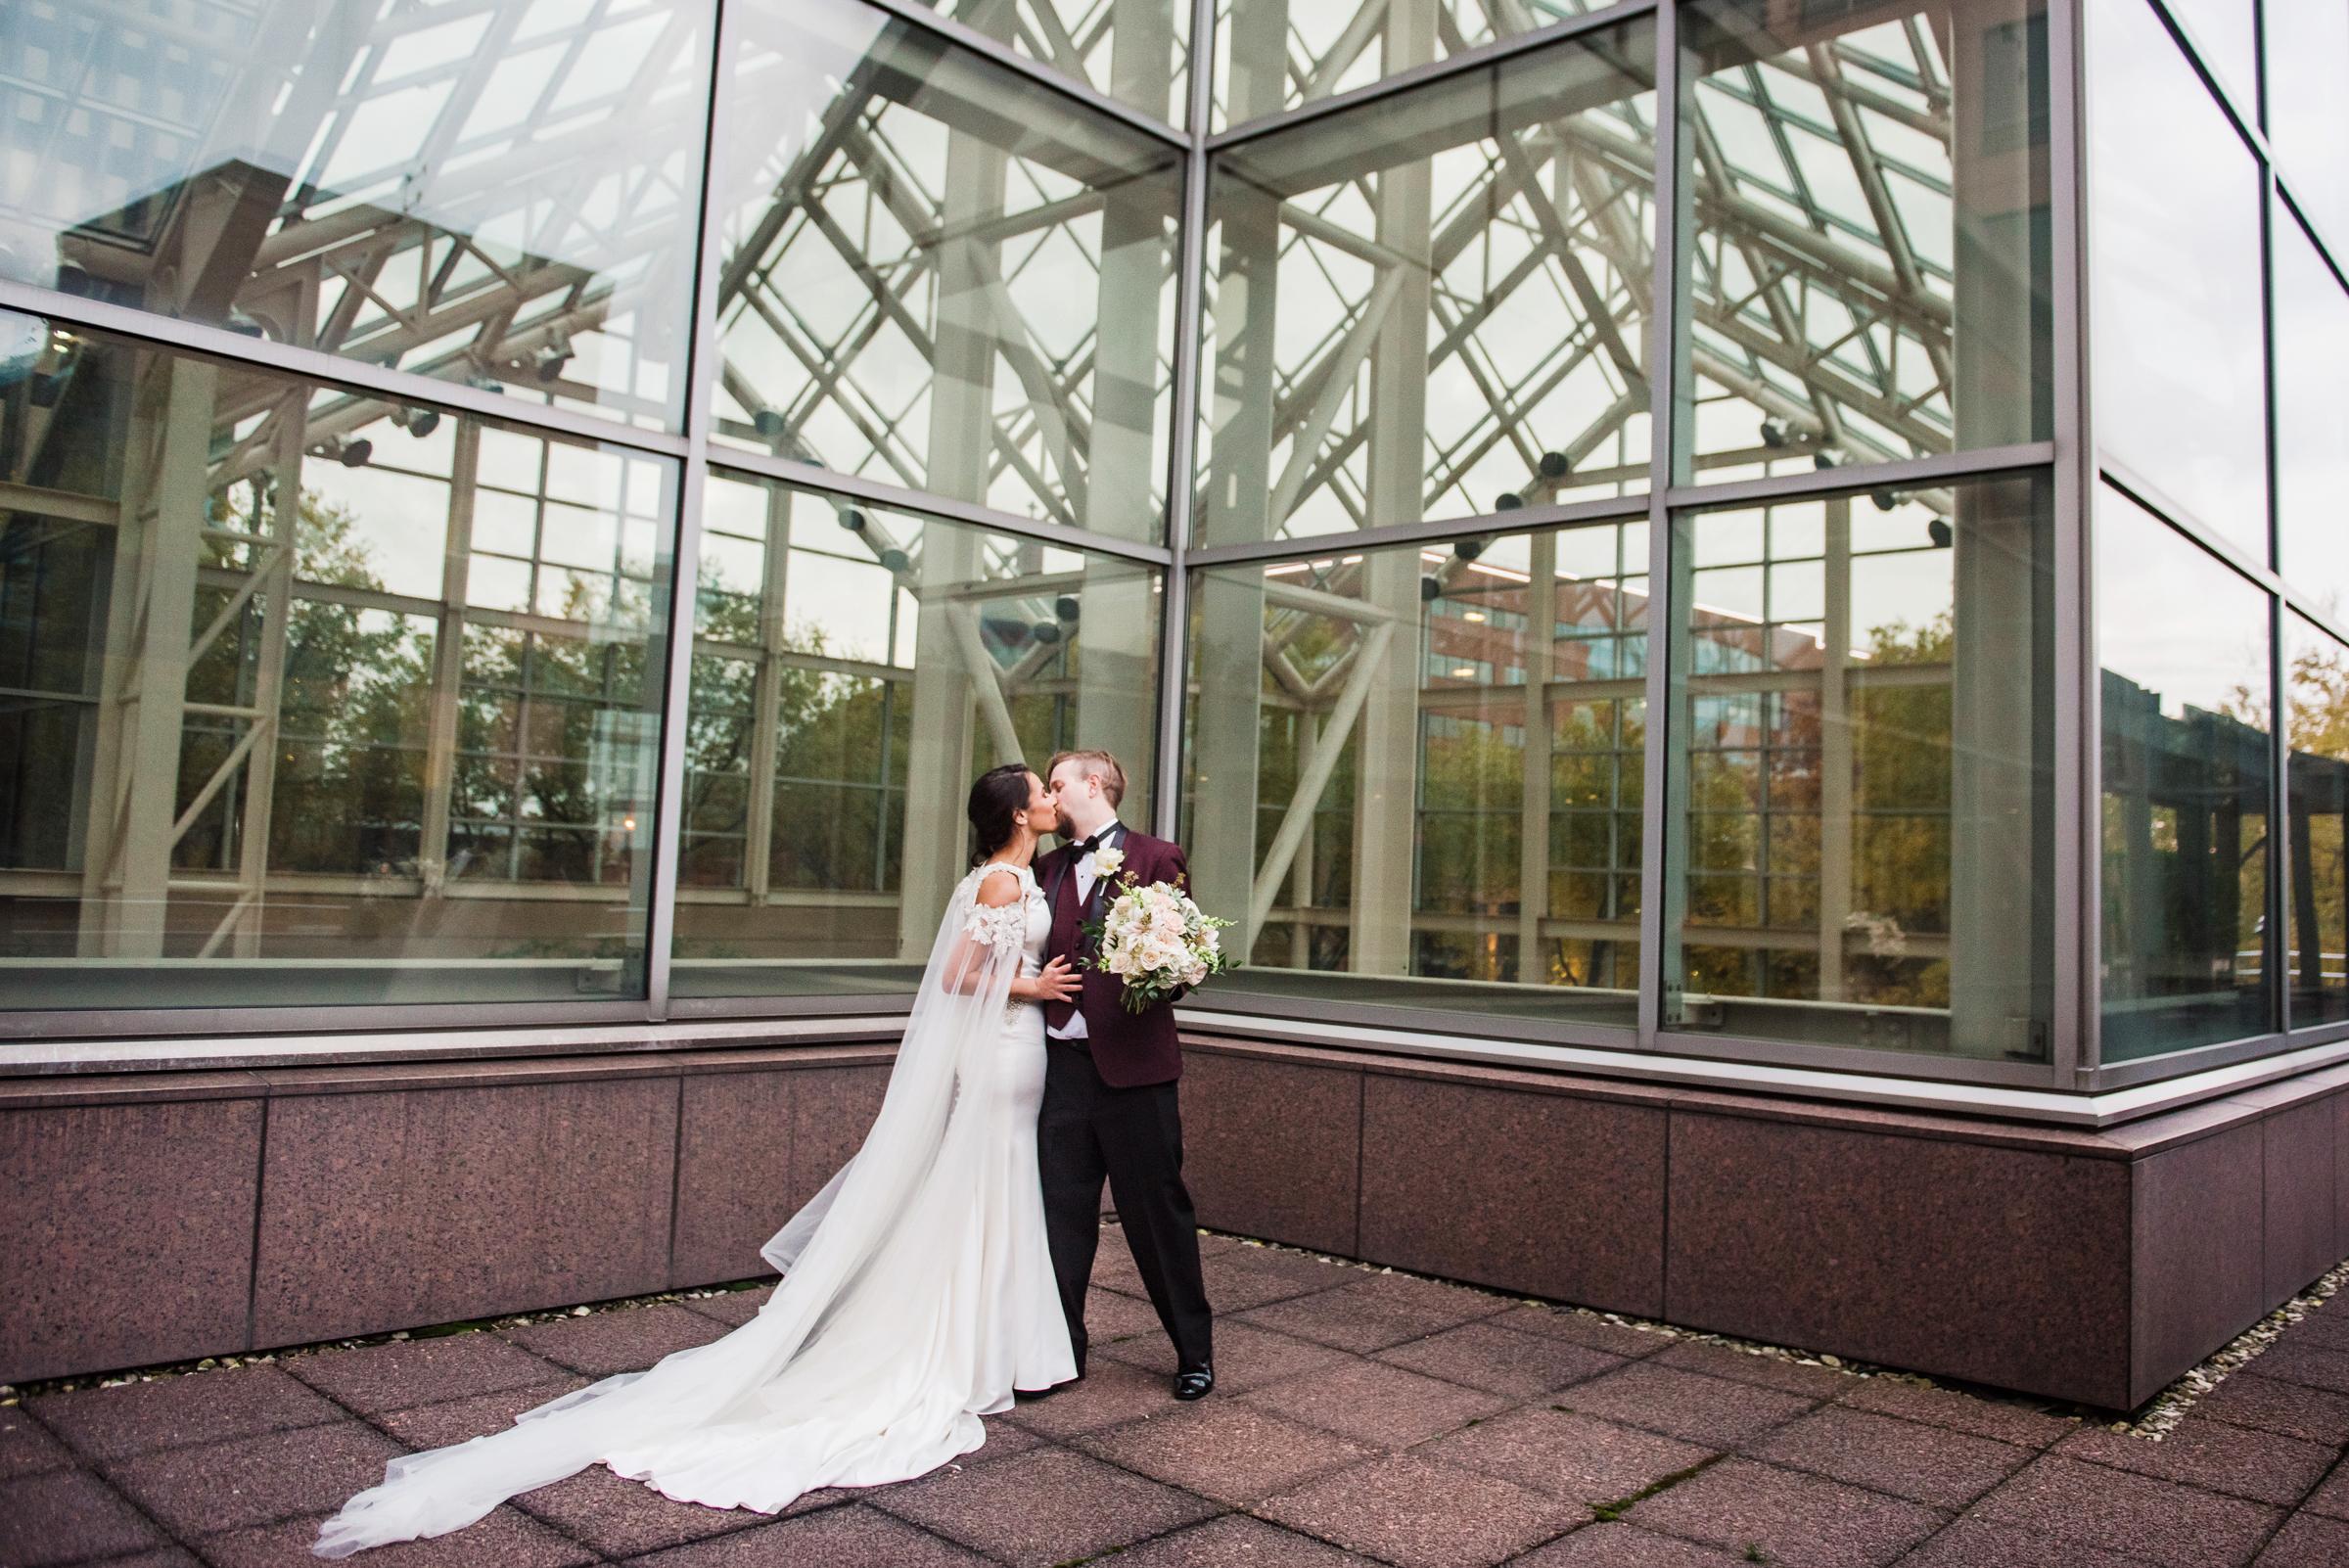 Wintergarden_by_Monroes_Rochester_Wedding_JILL_STUDIO_Rochester_NY_Photographer_174907.jpg